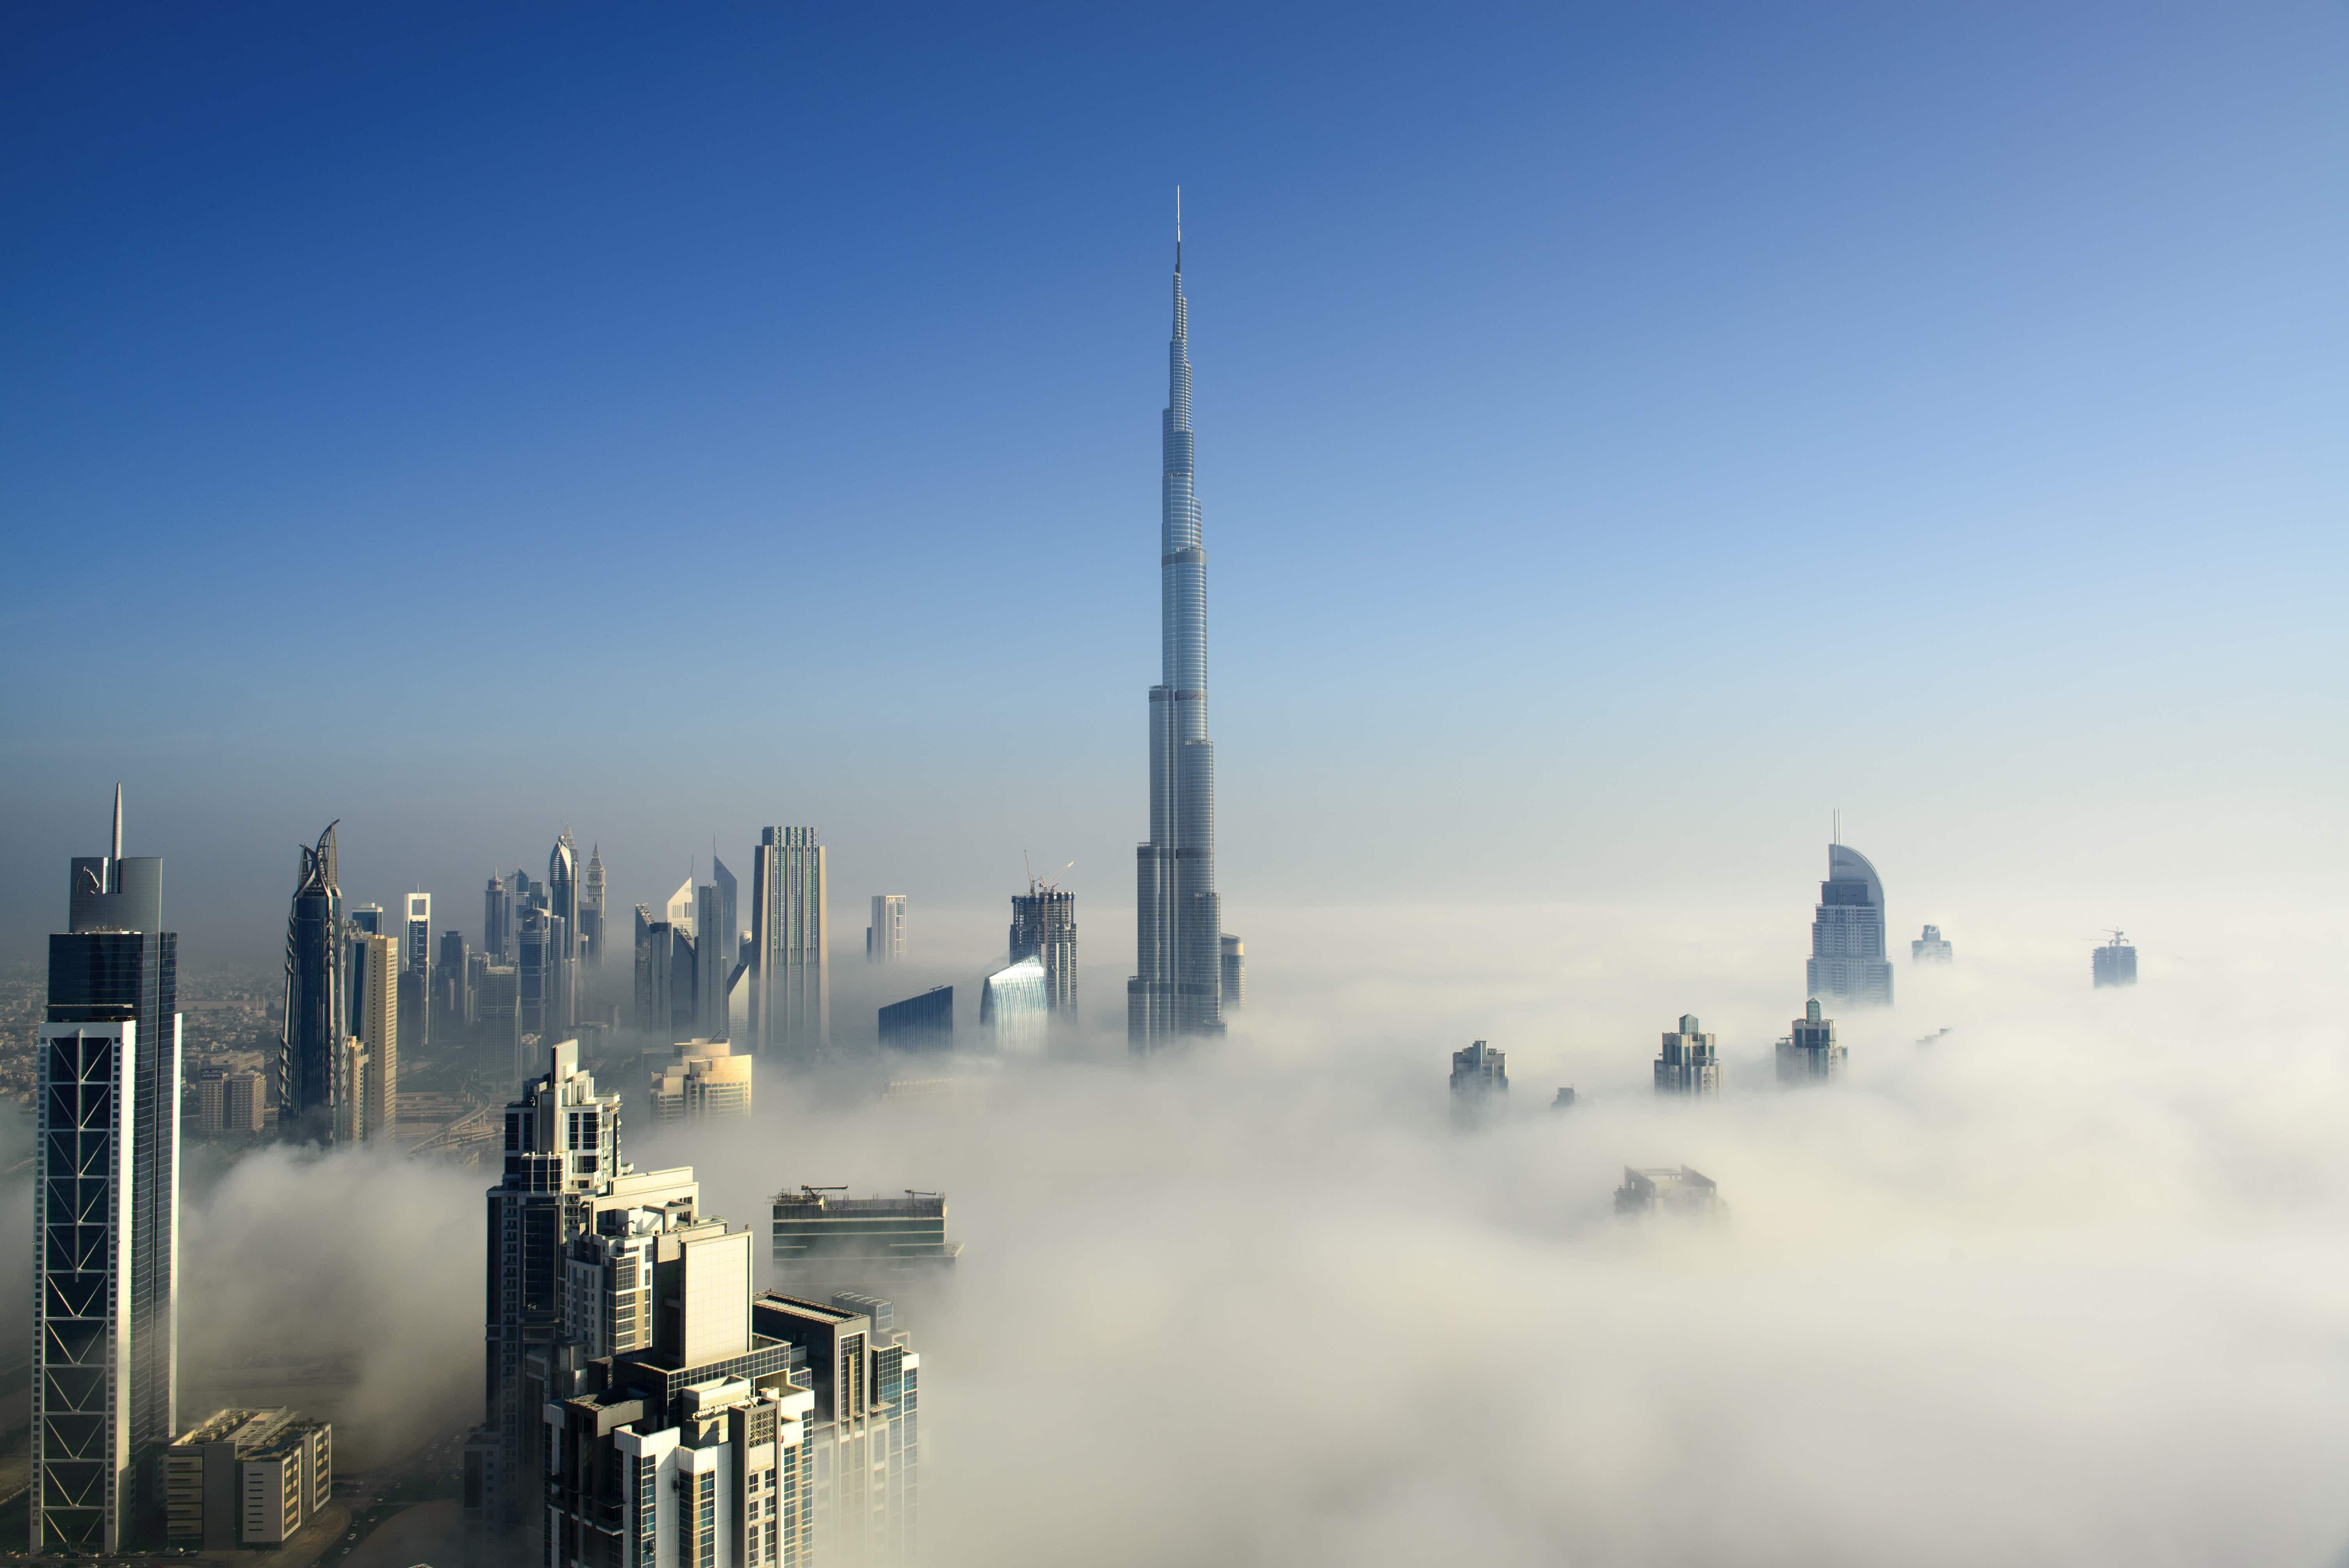 Dubai Downtown Skyline in early morning fog, United Arab Emirates